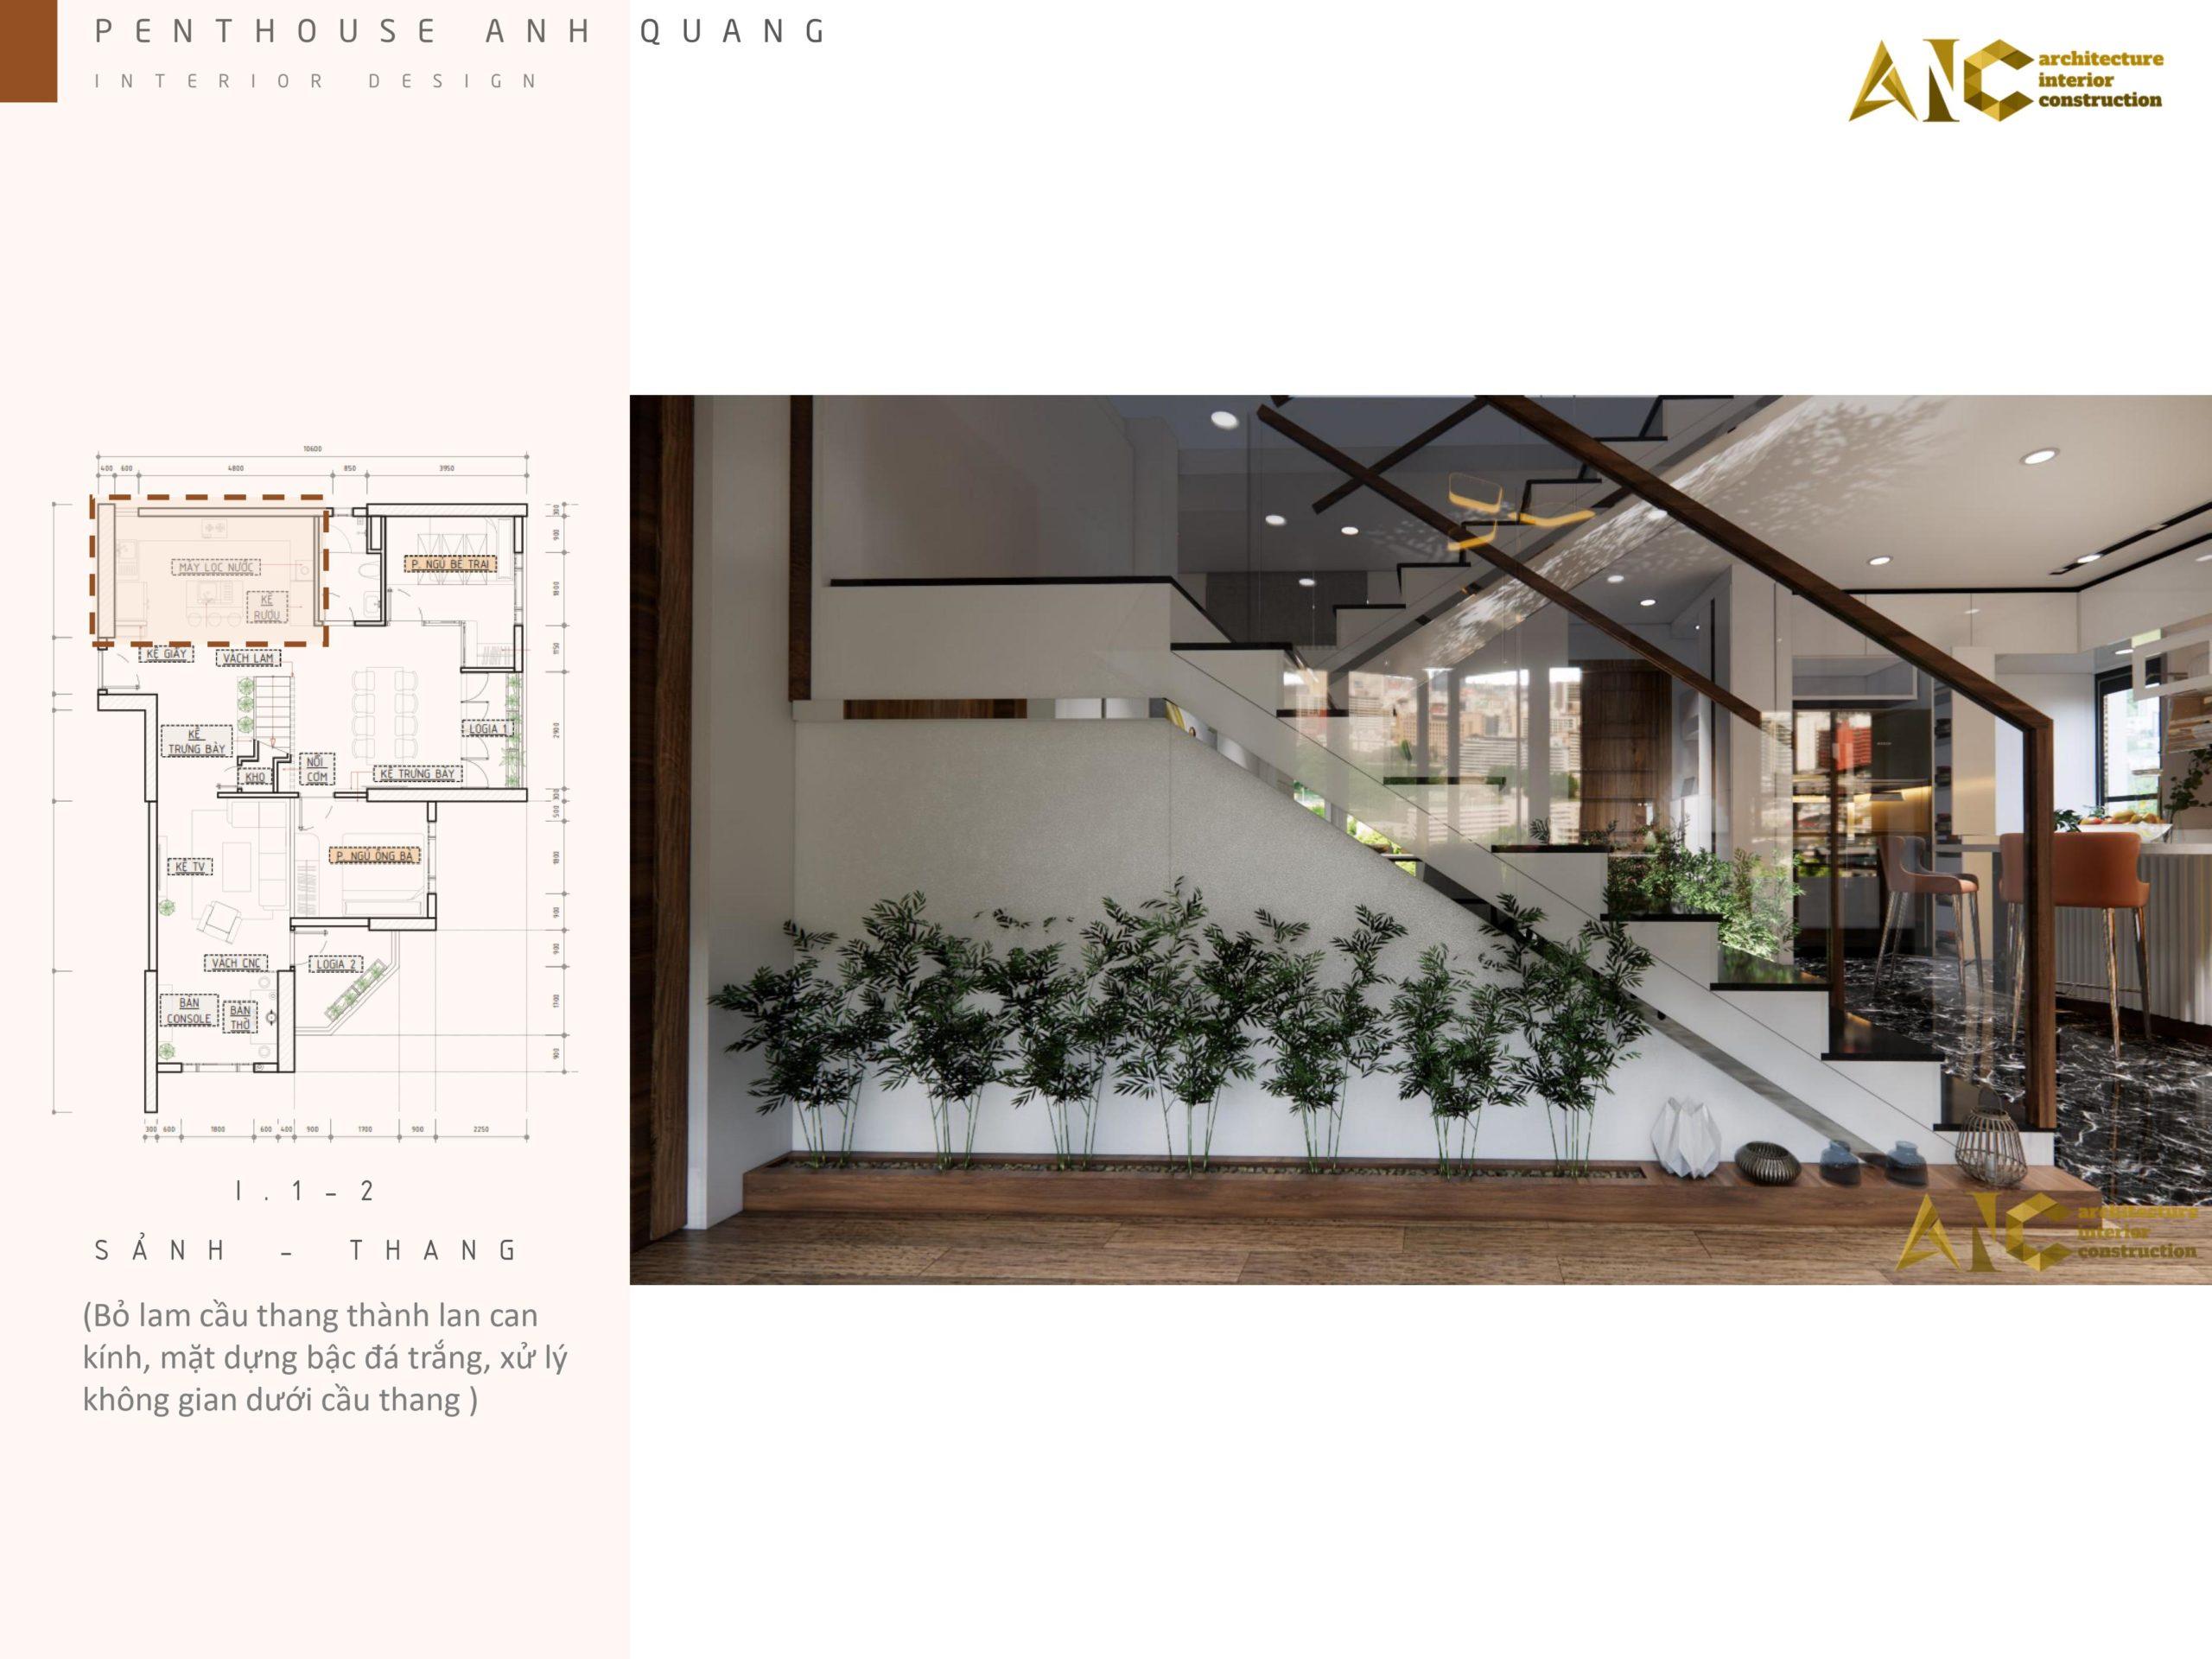 Penthouse-Anh-Quang-AIC-JSC-0009